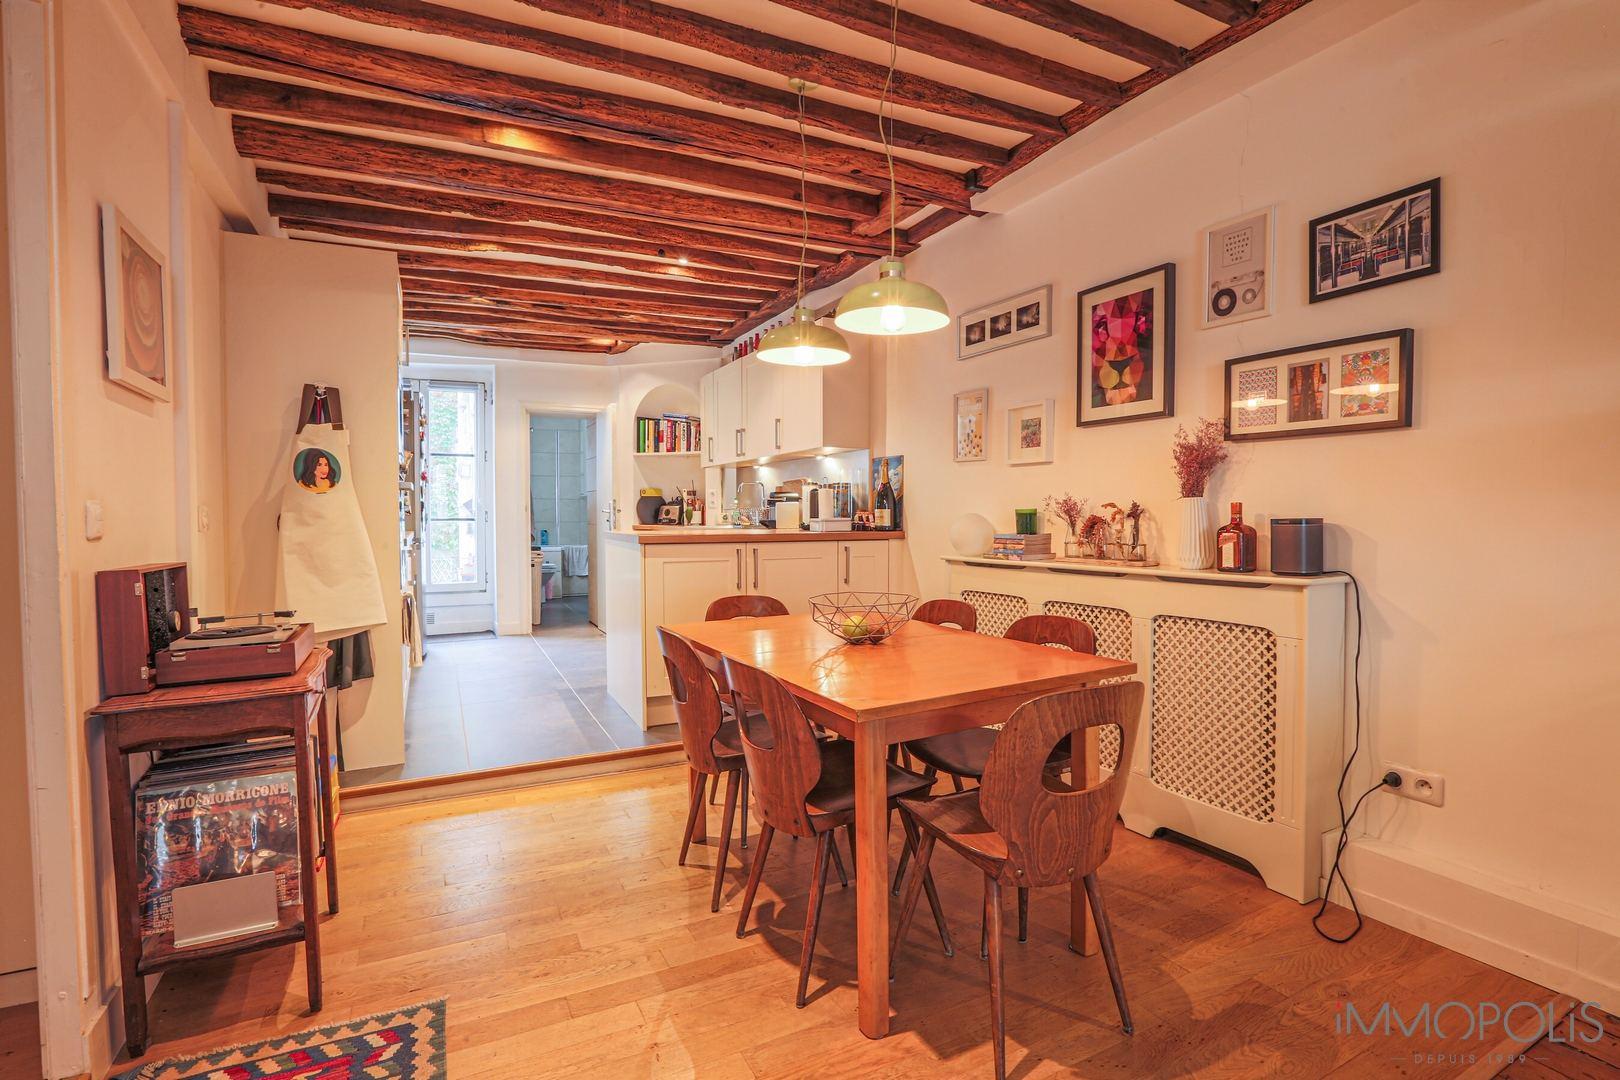 VILLAGE RAmey, Beautiful 2/3 room apartment of 53m² 4